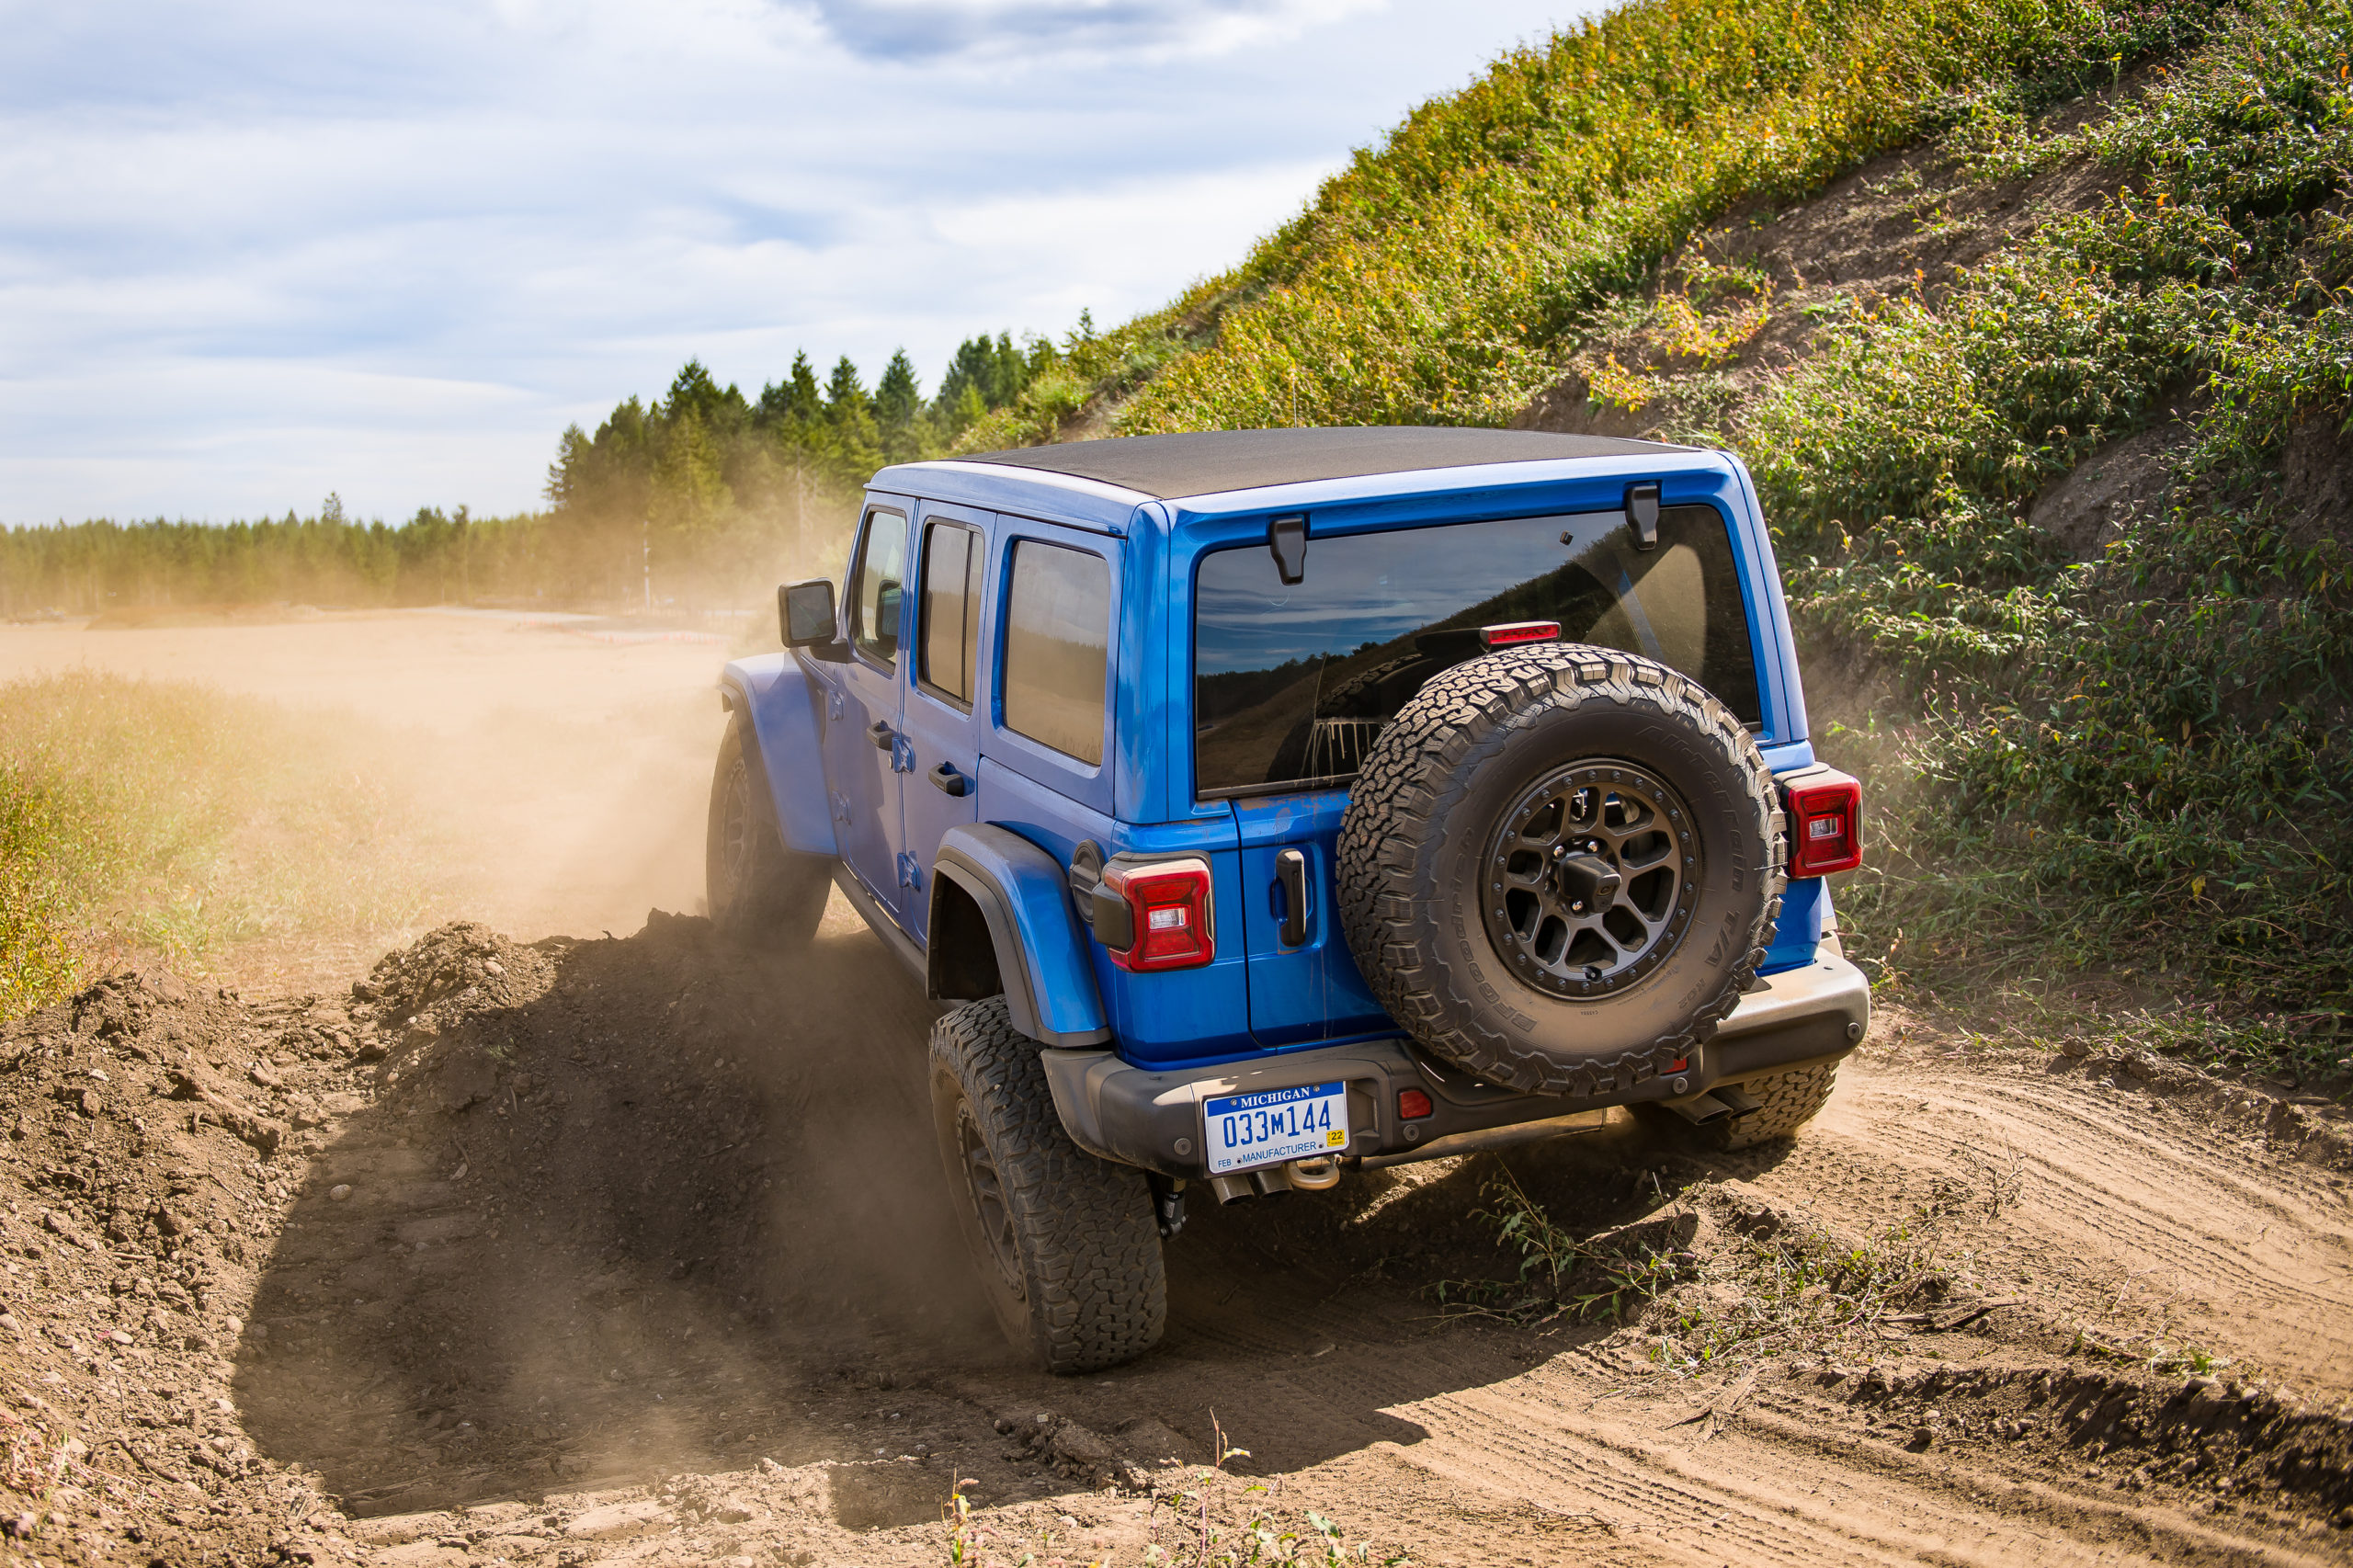 NWAPA Mudfest 2021 Jeep 392 Wrangler off-road